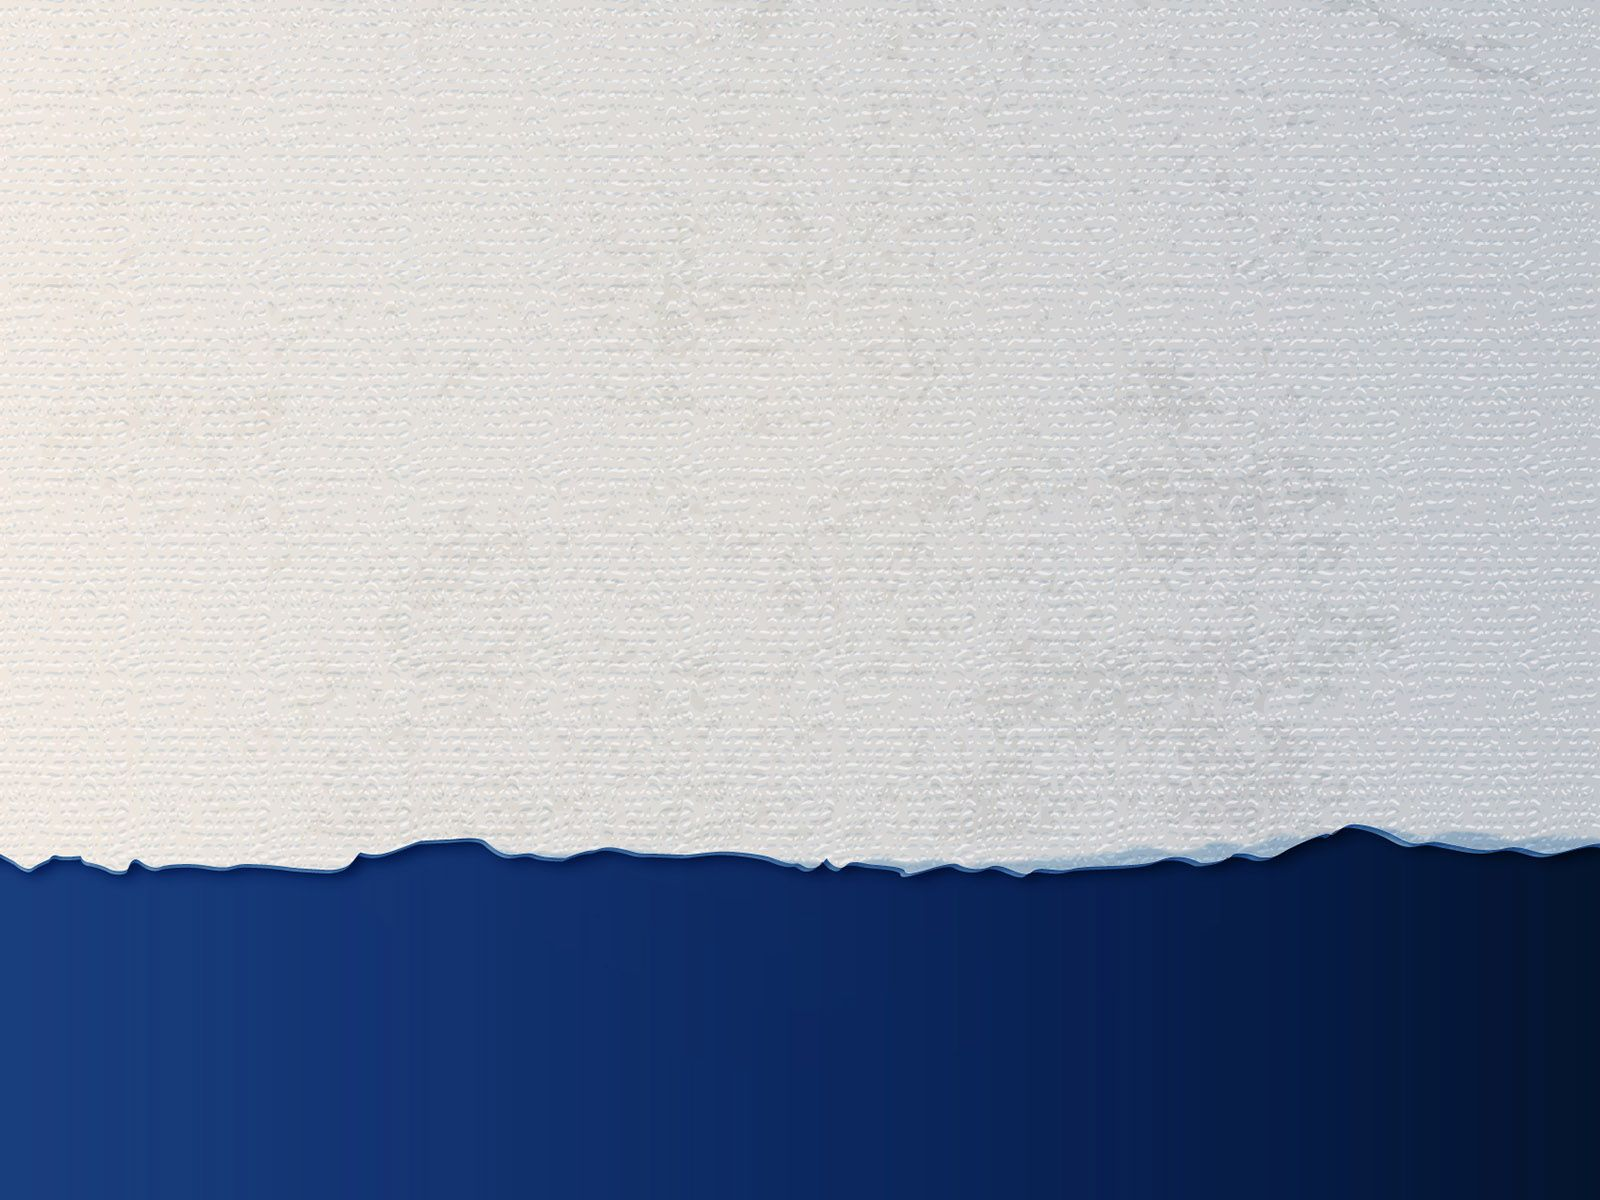 Paper-Textures-Powerpoint-Backgrounds.jpg (1600×1200 ...